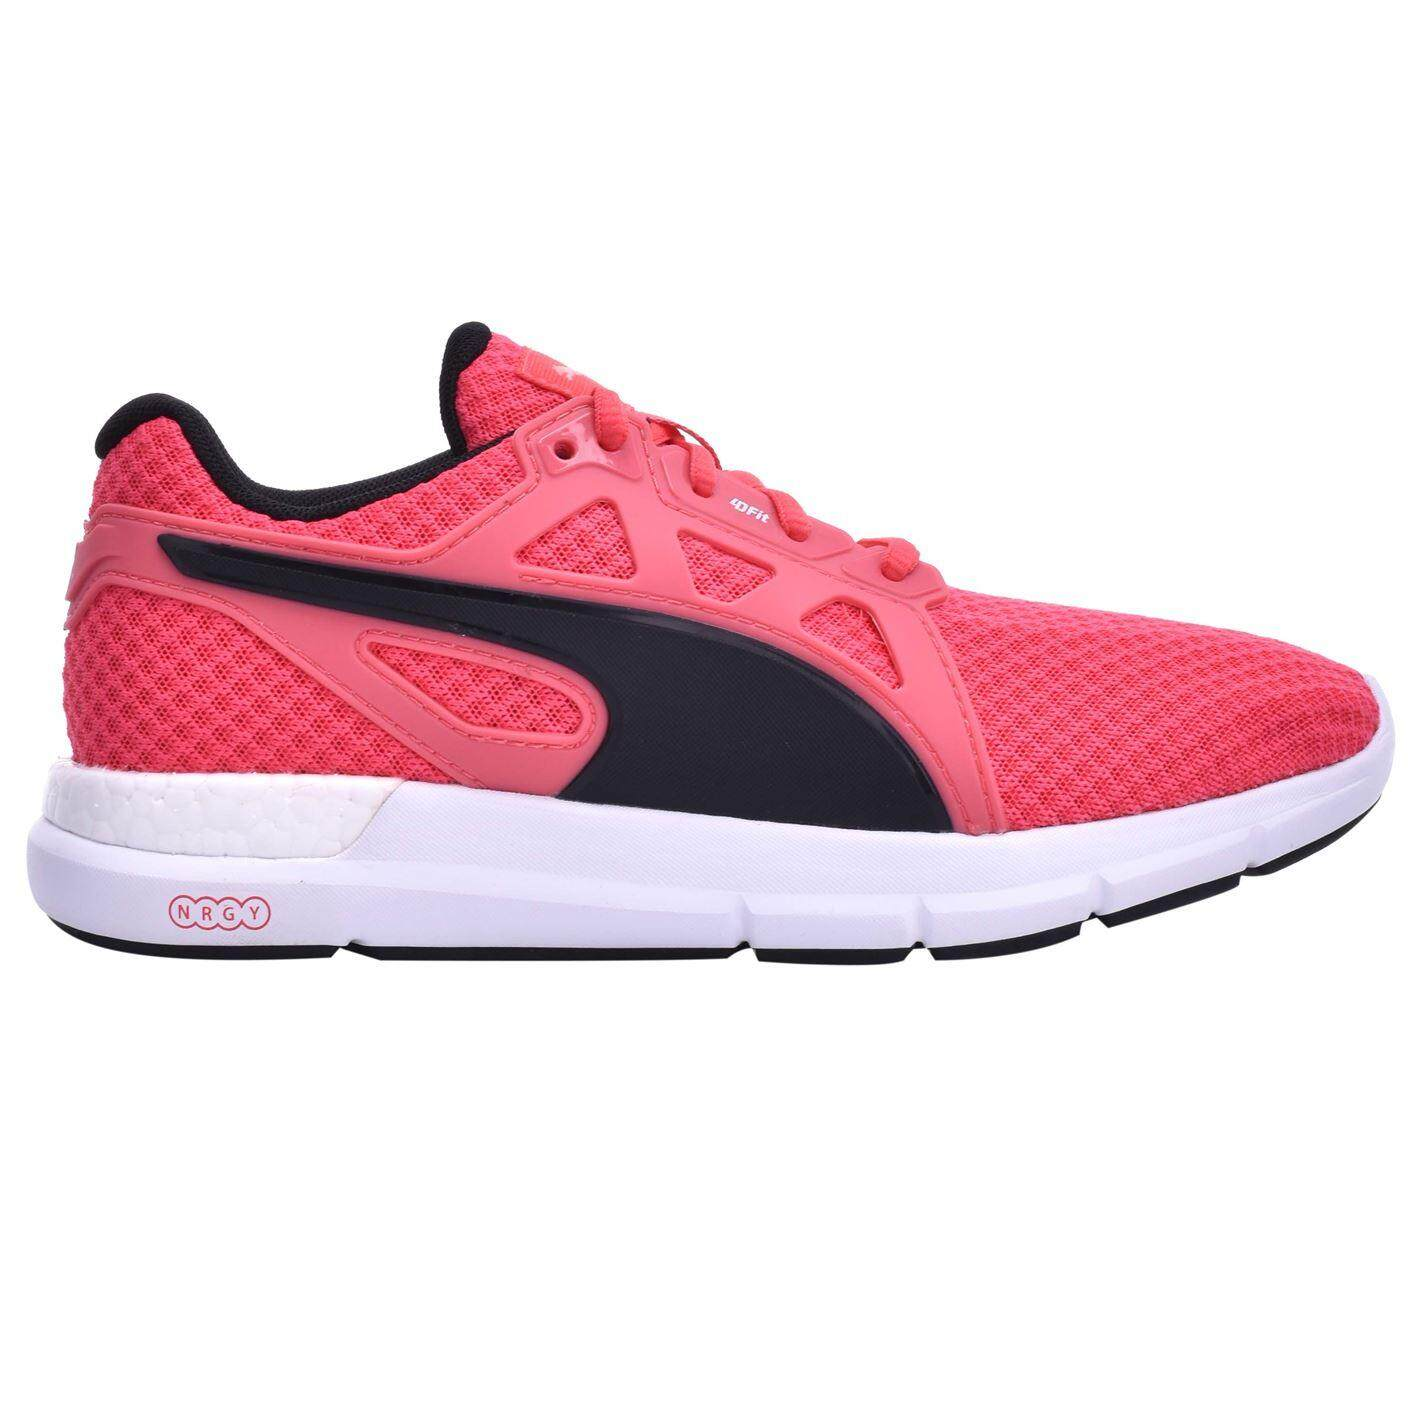 Puma_Womens NRGY Dynamo Running Shoes (Pink/Black)